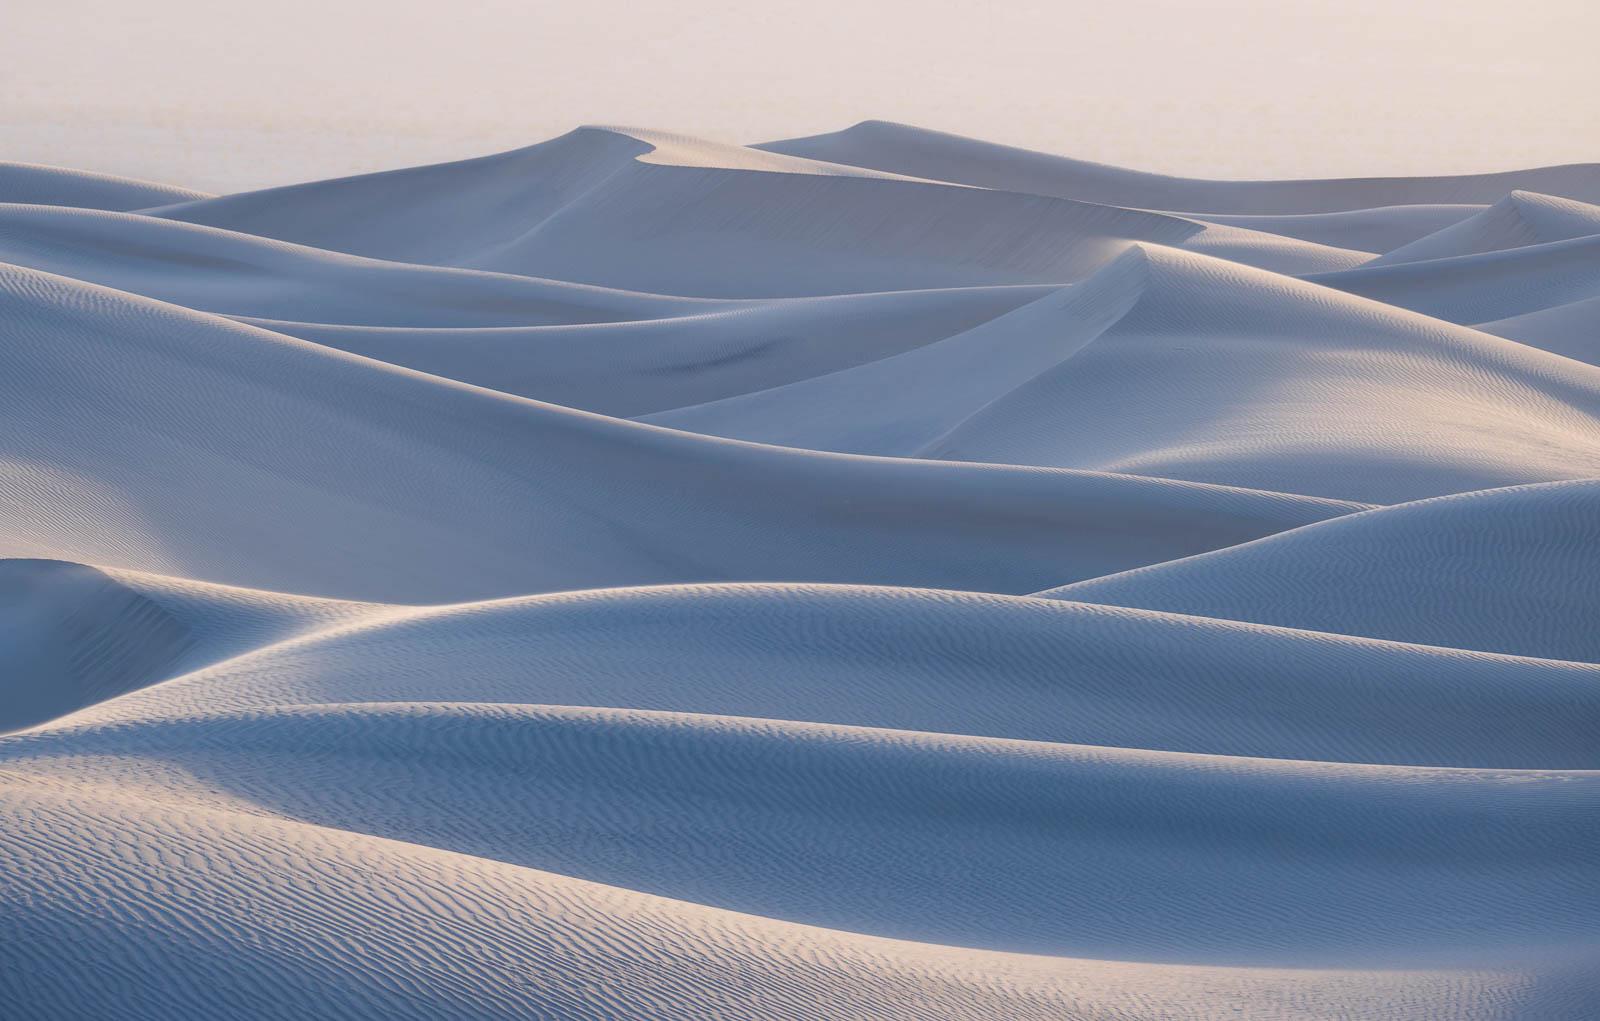 blue, california, death valley national park, landscape orientation, mesquite dunes, pastel, sand dunes, mojave desert